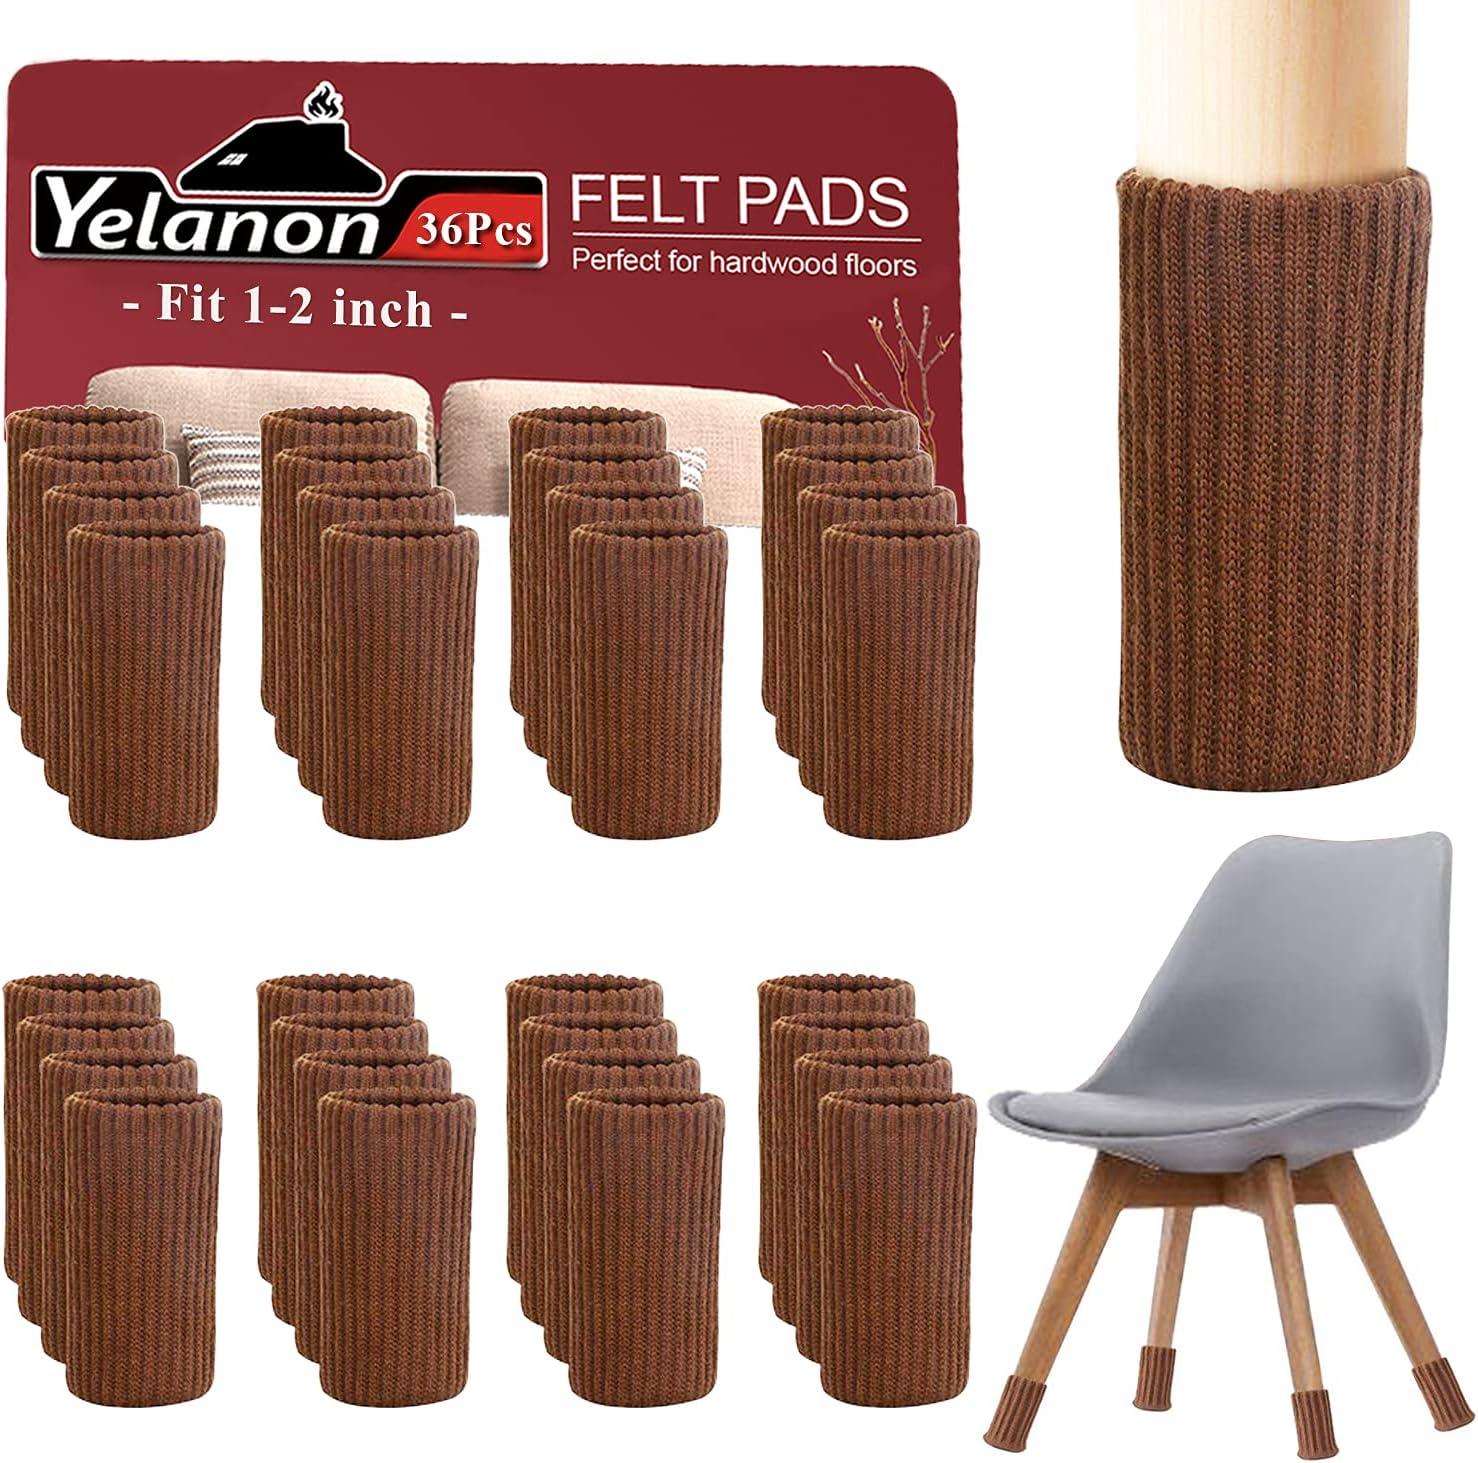 "Yelanon Furniture Socks 36 Pcs - Chair Leg Floor Protectors Knitted Chair Leg Socks for Hardwood Floors - Furniture Feet Protector Furniture Caps Set, Chair Covers for Legs with Diameter 1""-2"", Brown"